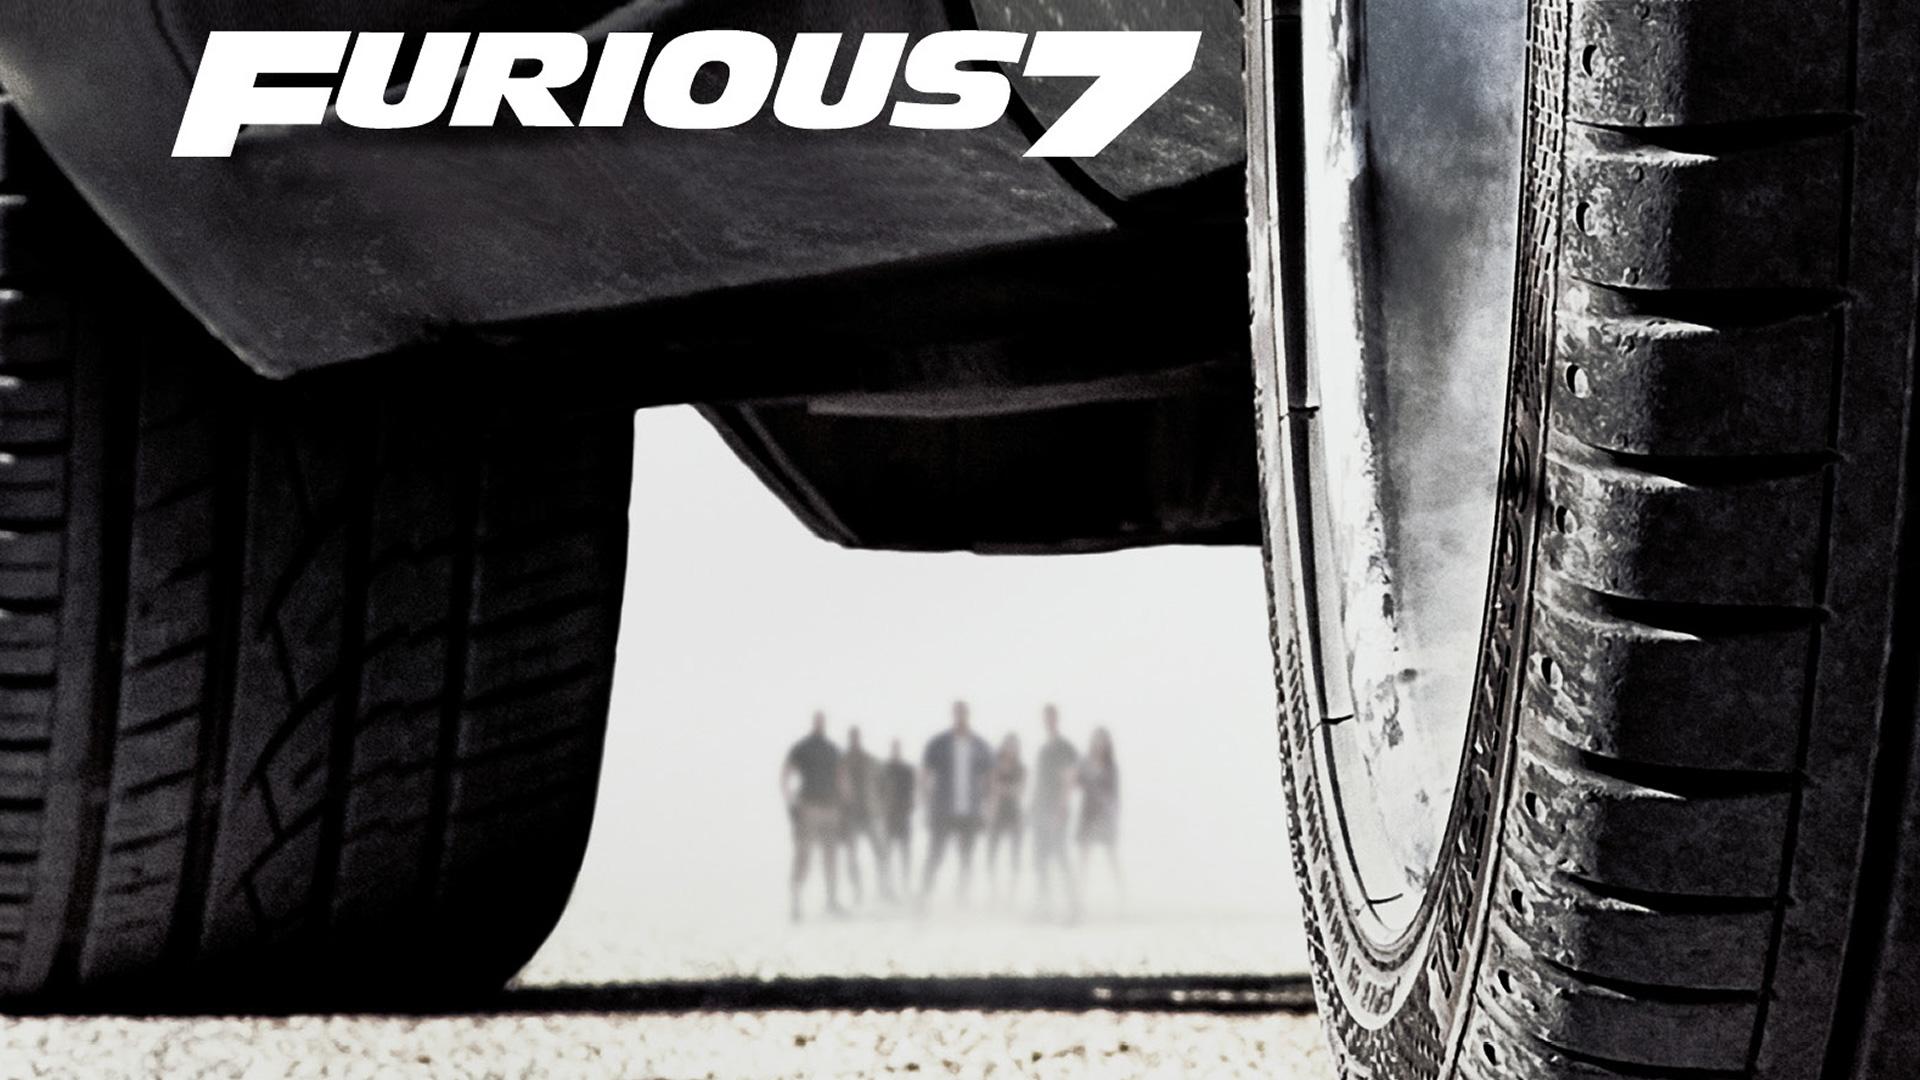 Furious 7 Movie Poster   1920x1080   Full HD 169   Wallpaper 4016 on 1920x1080